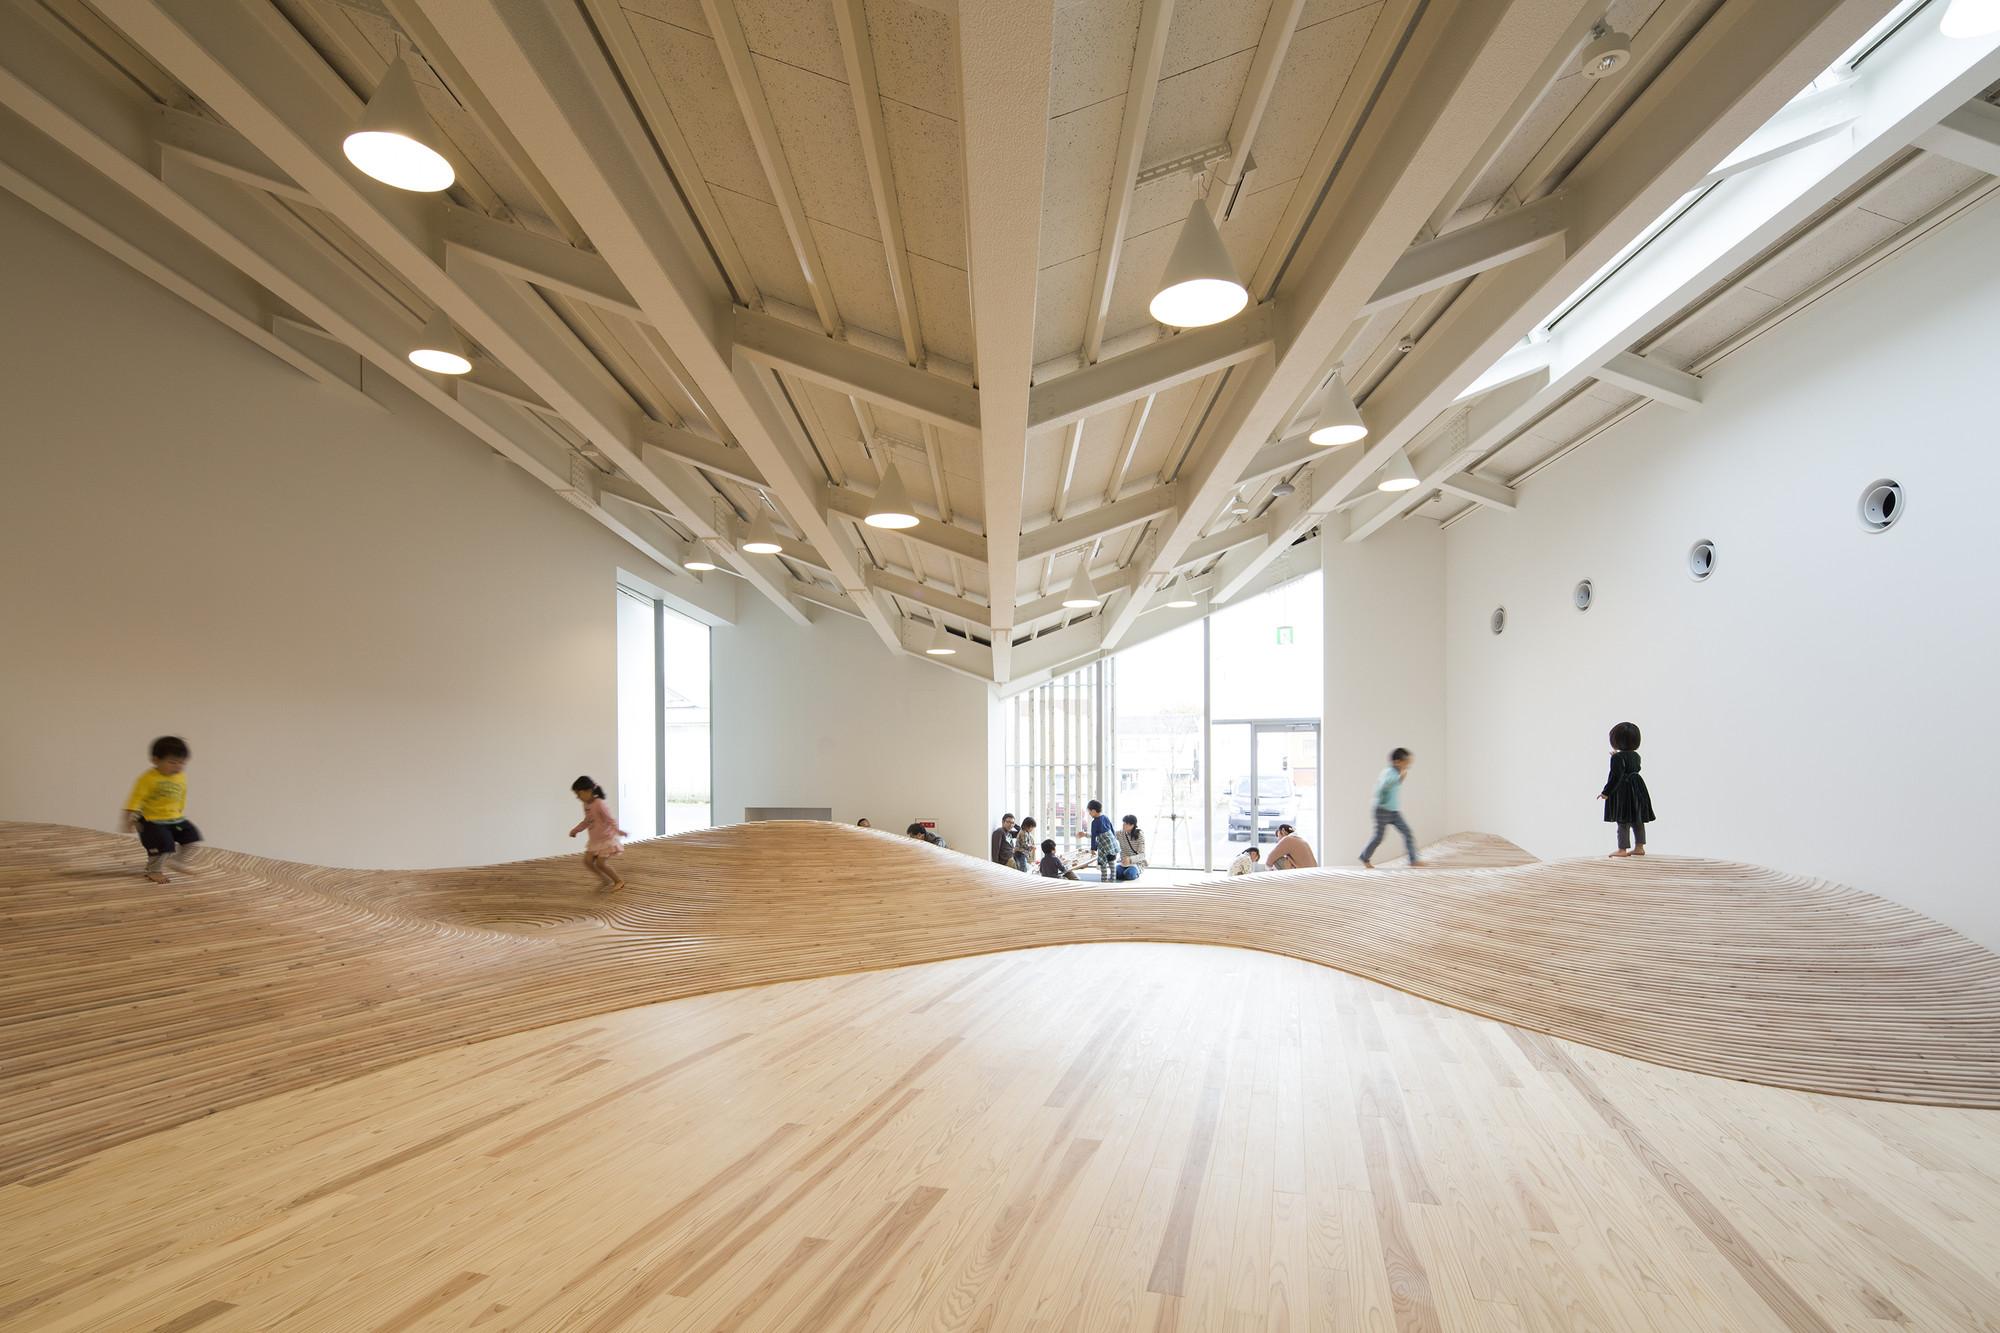 Towada Community Plaza / Kengo Kuma & Associates, © Kenta Hasegawa